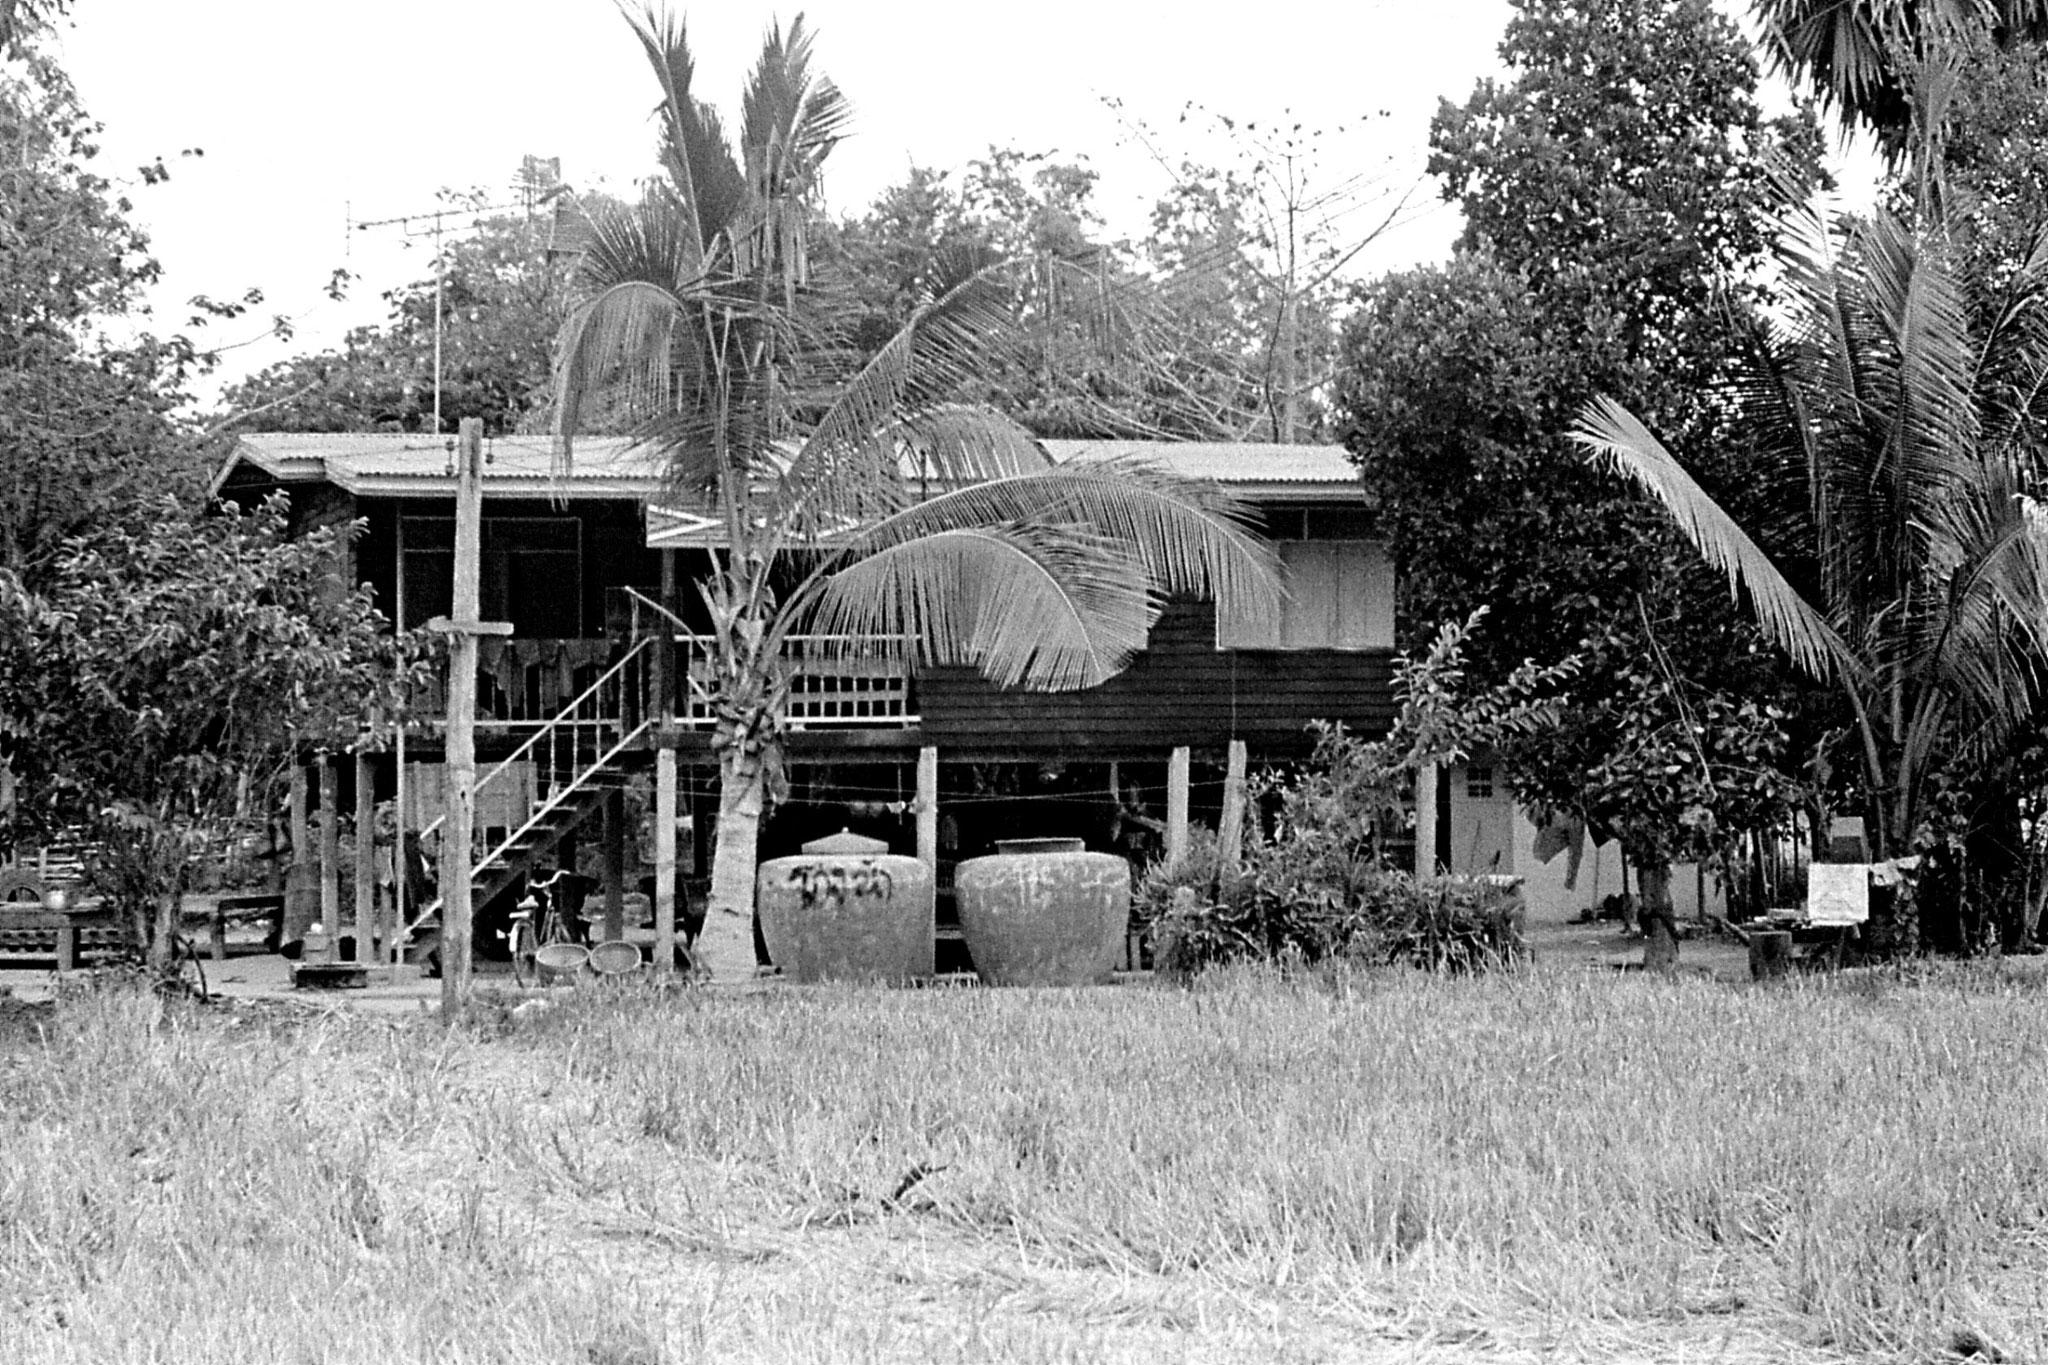 7/6/1990: 15: Manorom, farmer's house